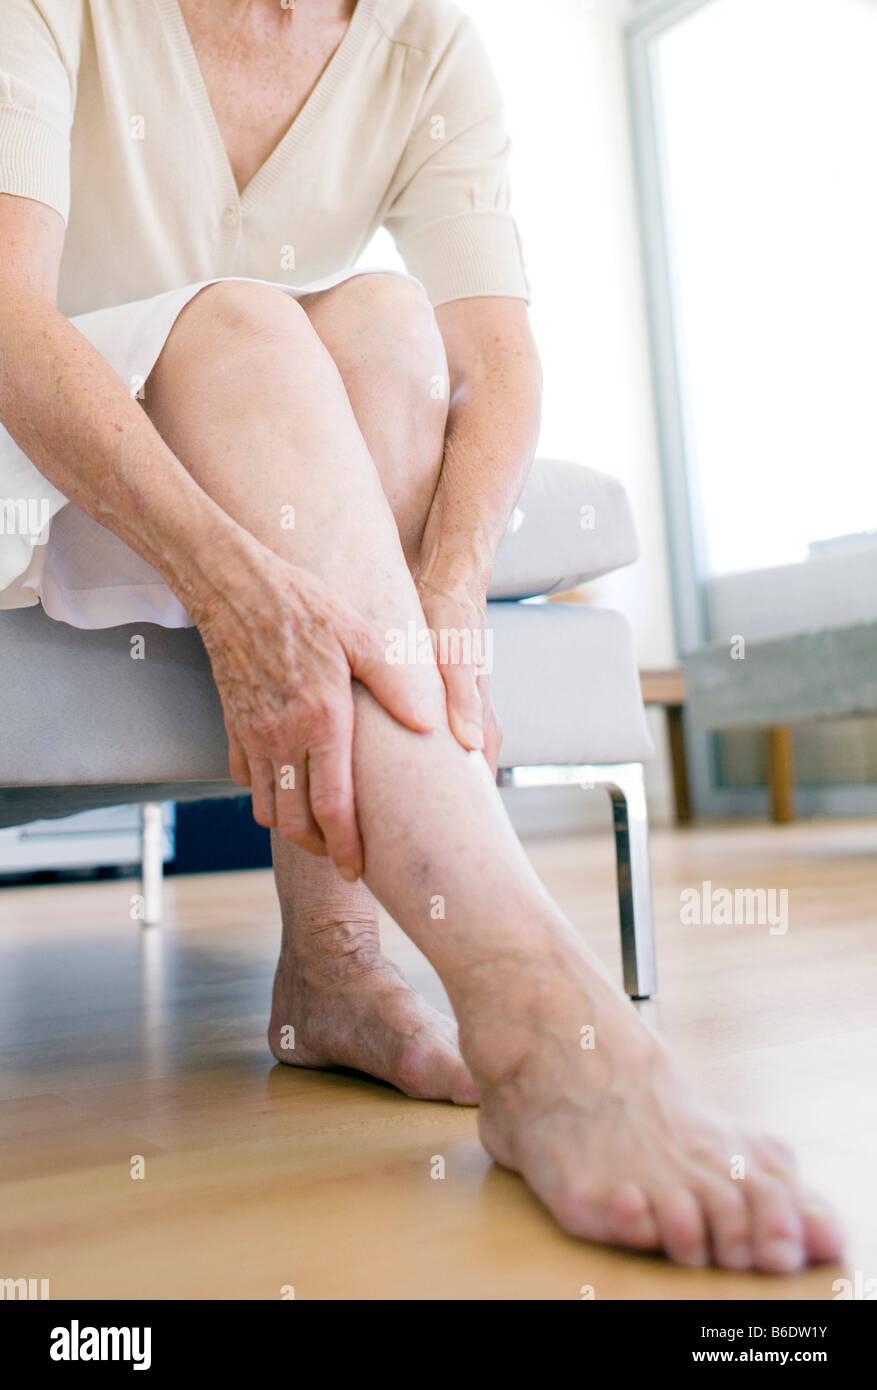 Woman rubbing her aching leg - Stock Image